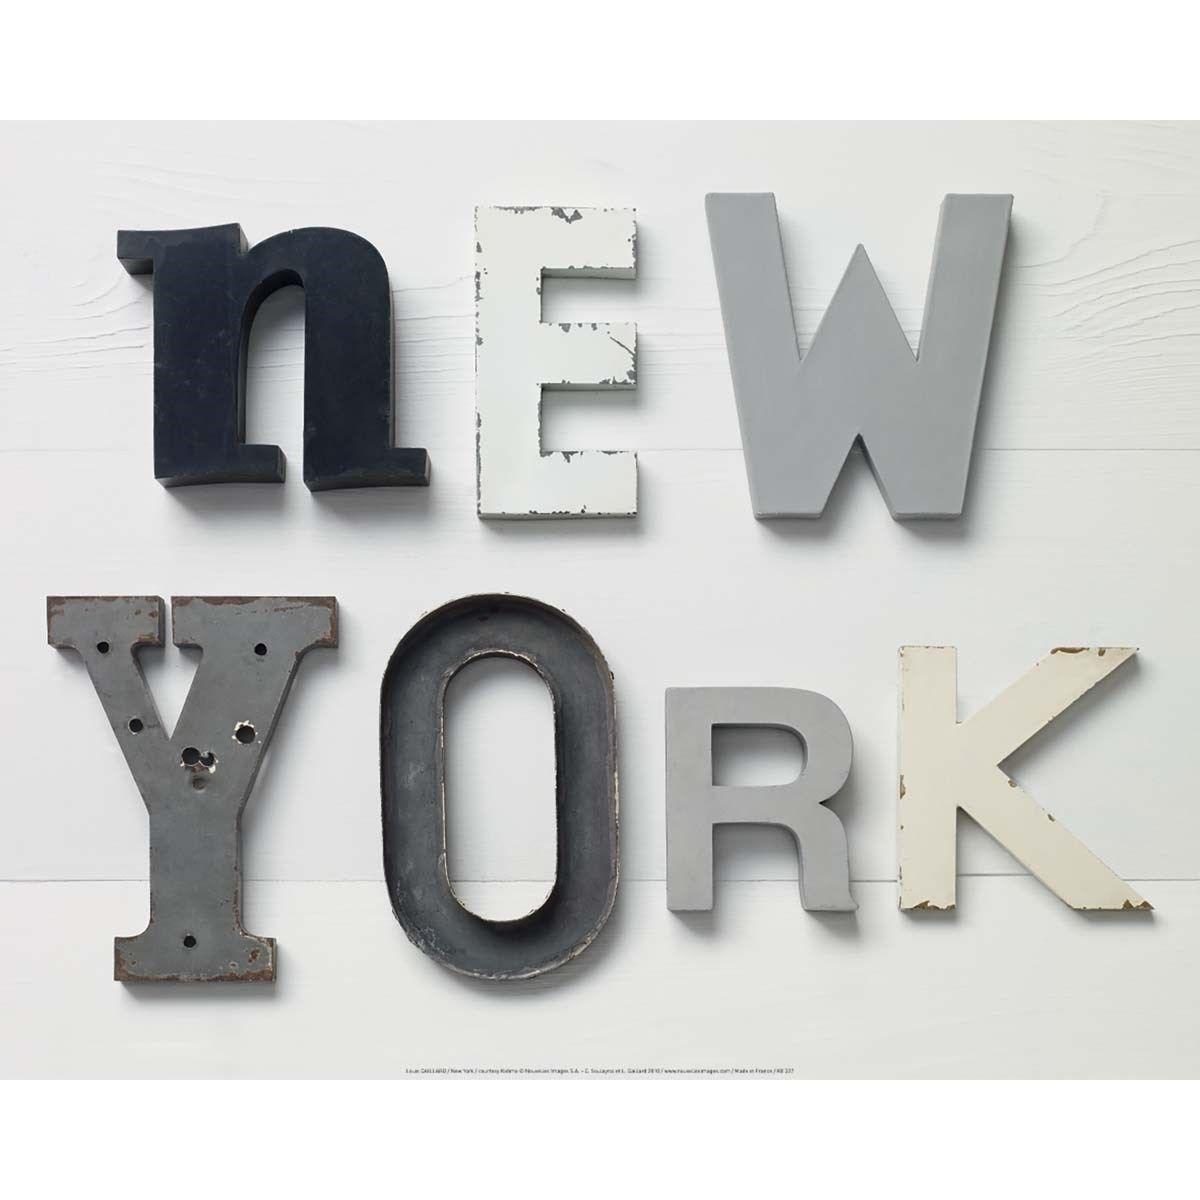 Louis GAILLARD Affiche 40x50 cm New York Camille SOULAYROL